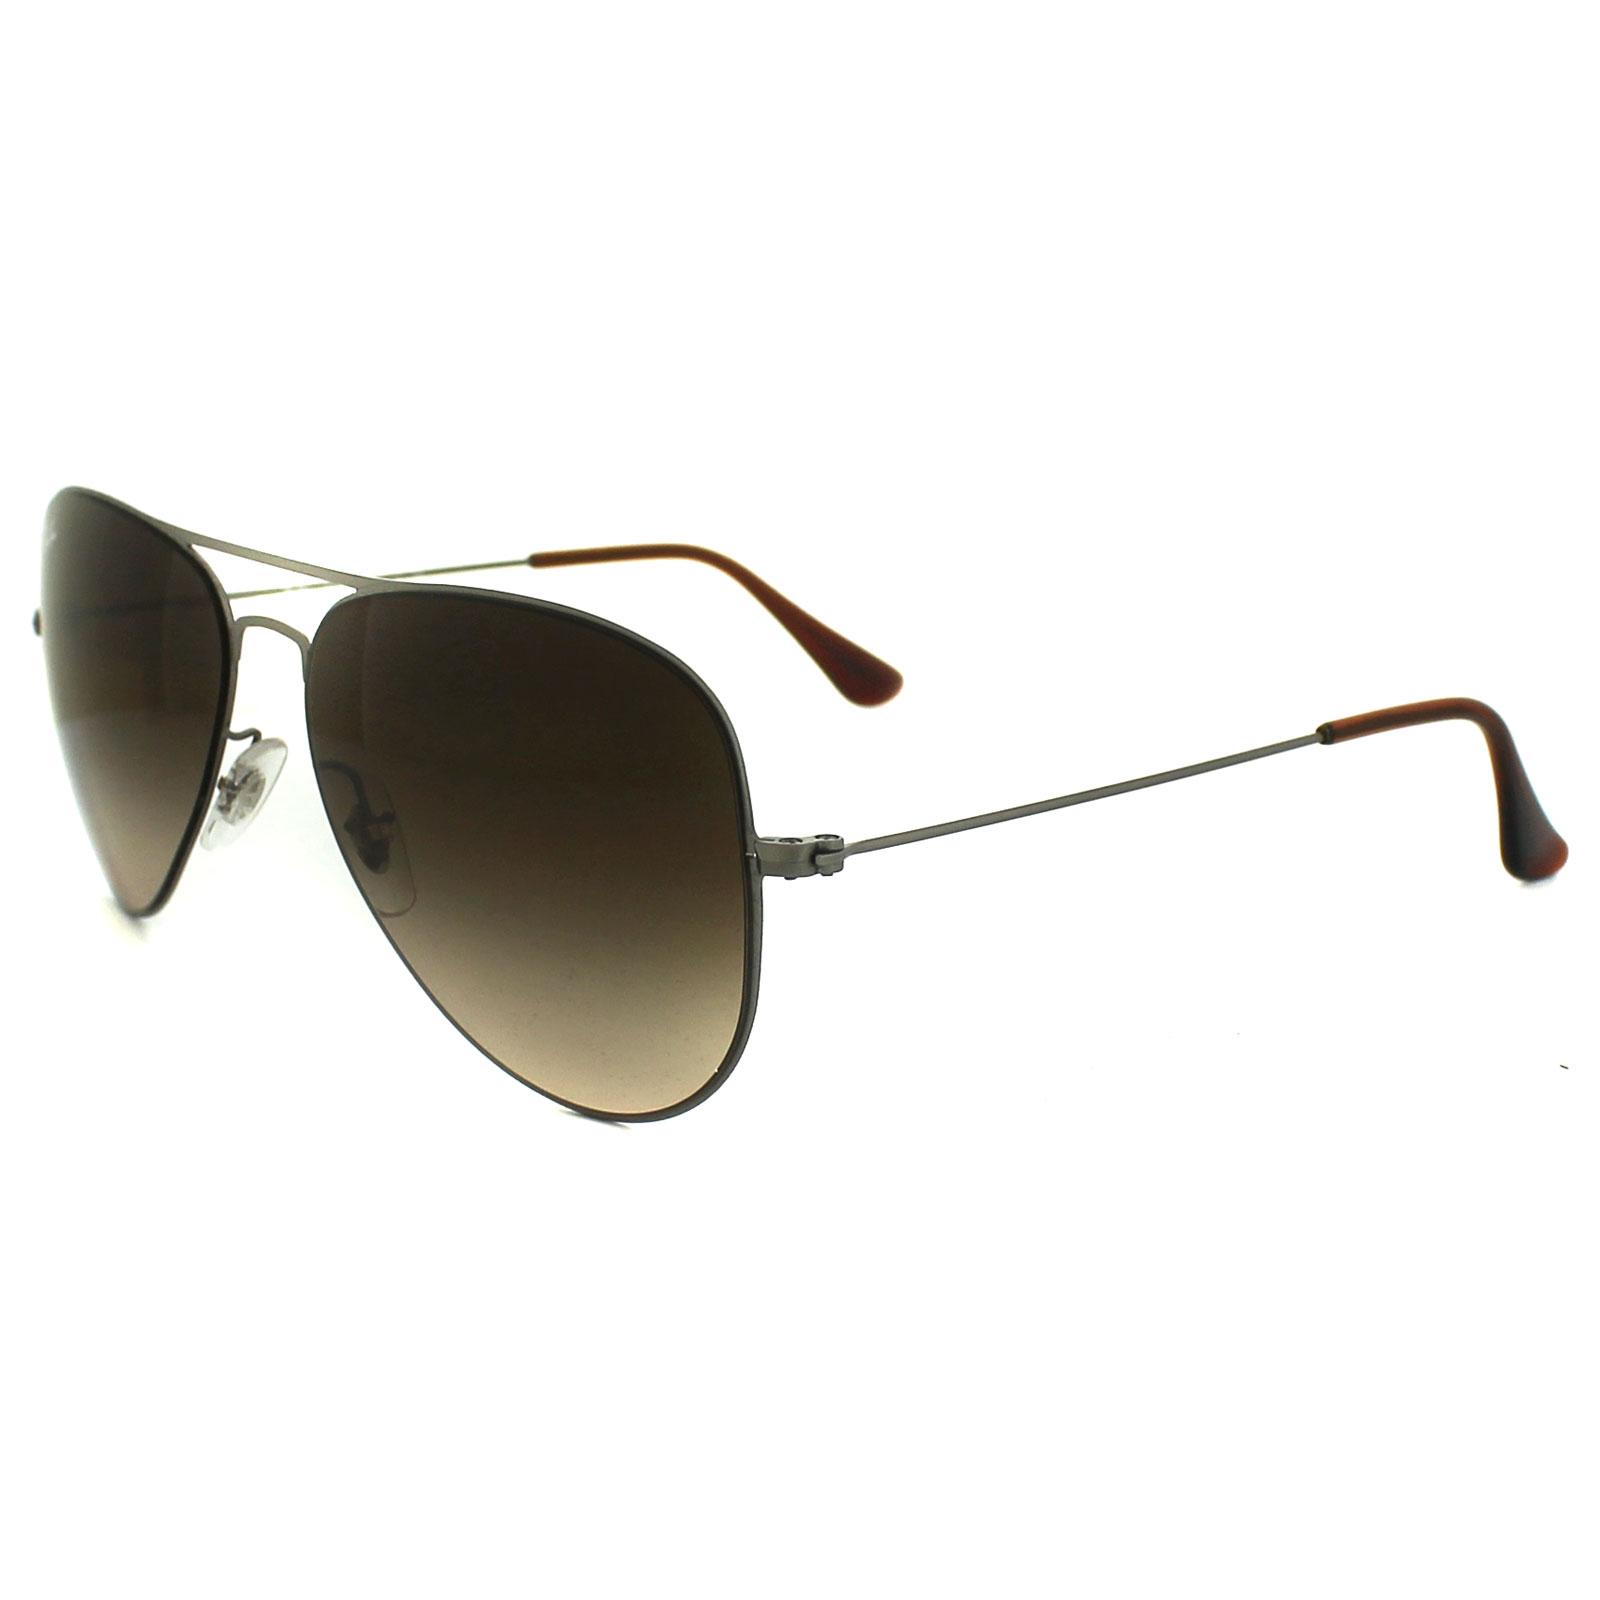 681869b081e Cheap Ray-Ban Aviator Flat Metal 3513 Sunglasses - Discounted Sunglasses